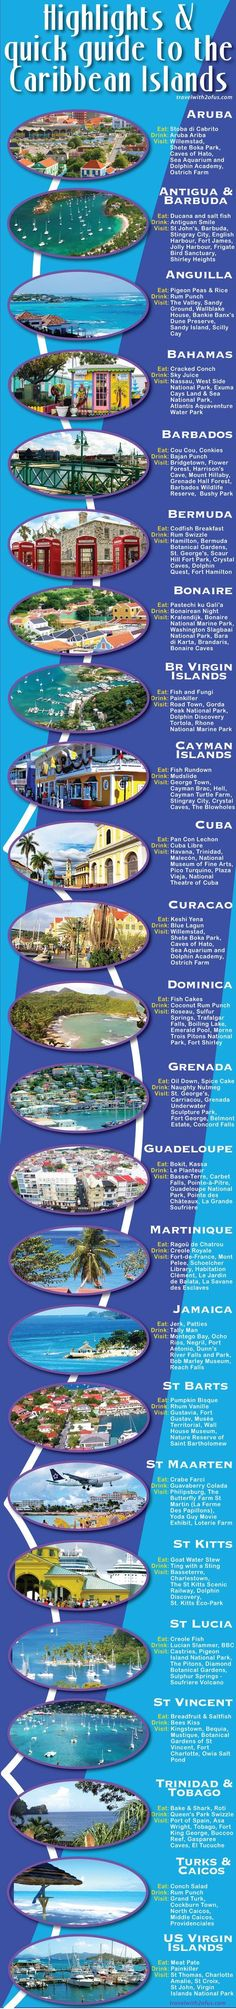 The Caribbean Island